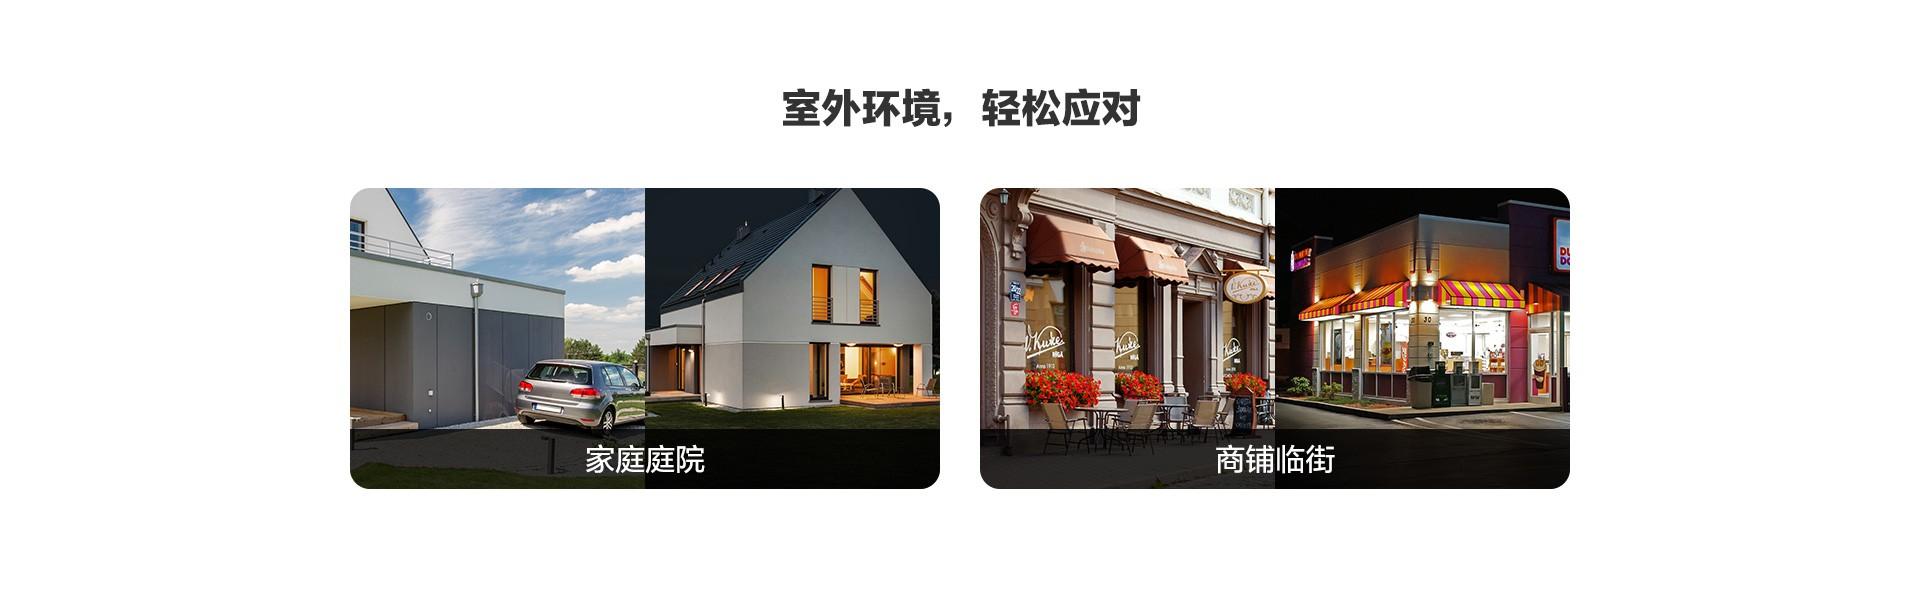 C3室外攝像機通用場景-web.jpg